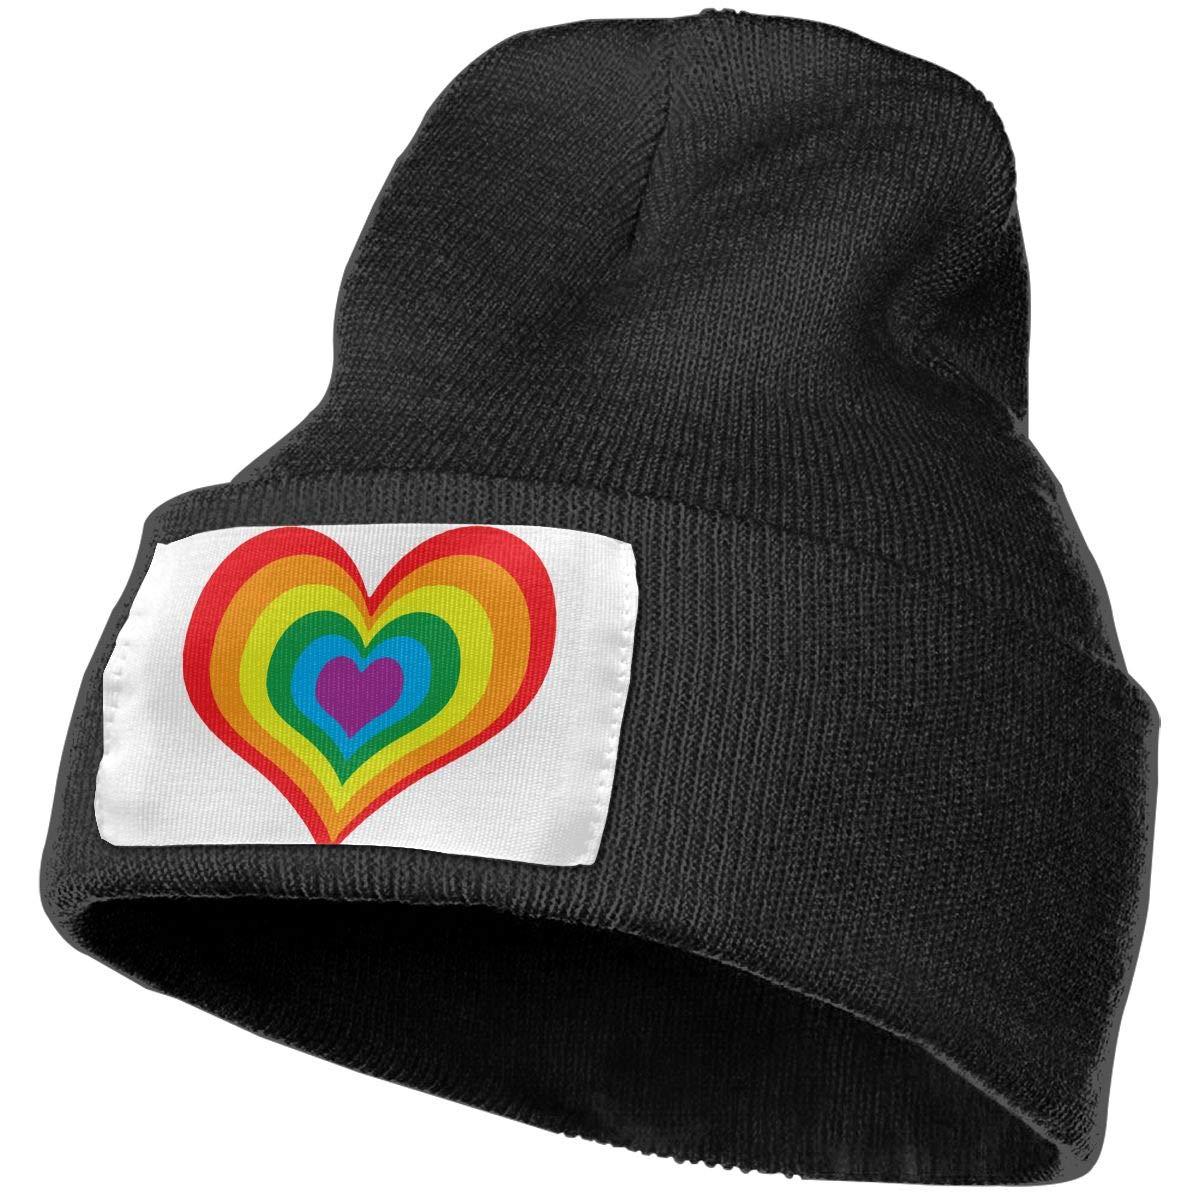 Rainbow Heart LGBT Women and Men Skull Caps Winter Warm Stretchy Knit Beanie Hats